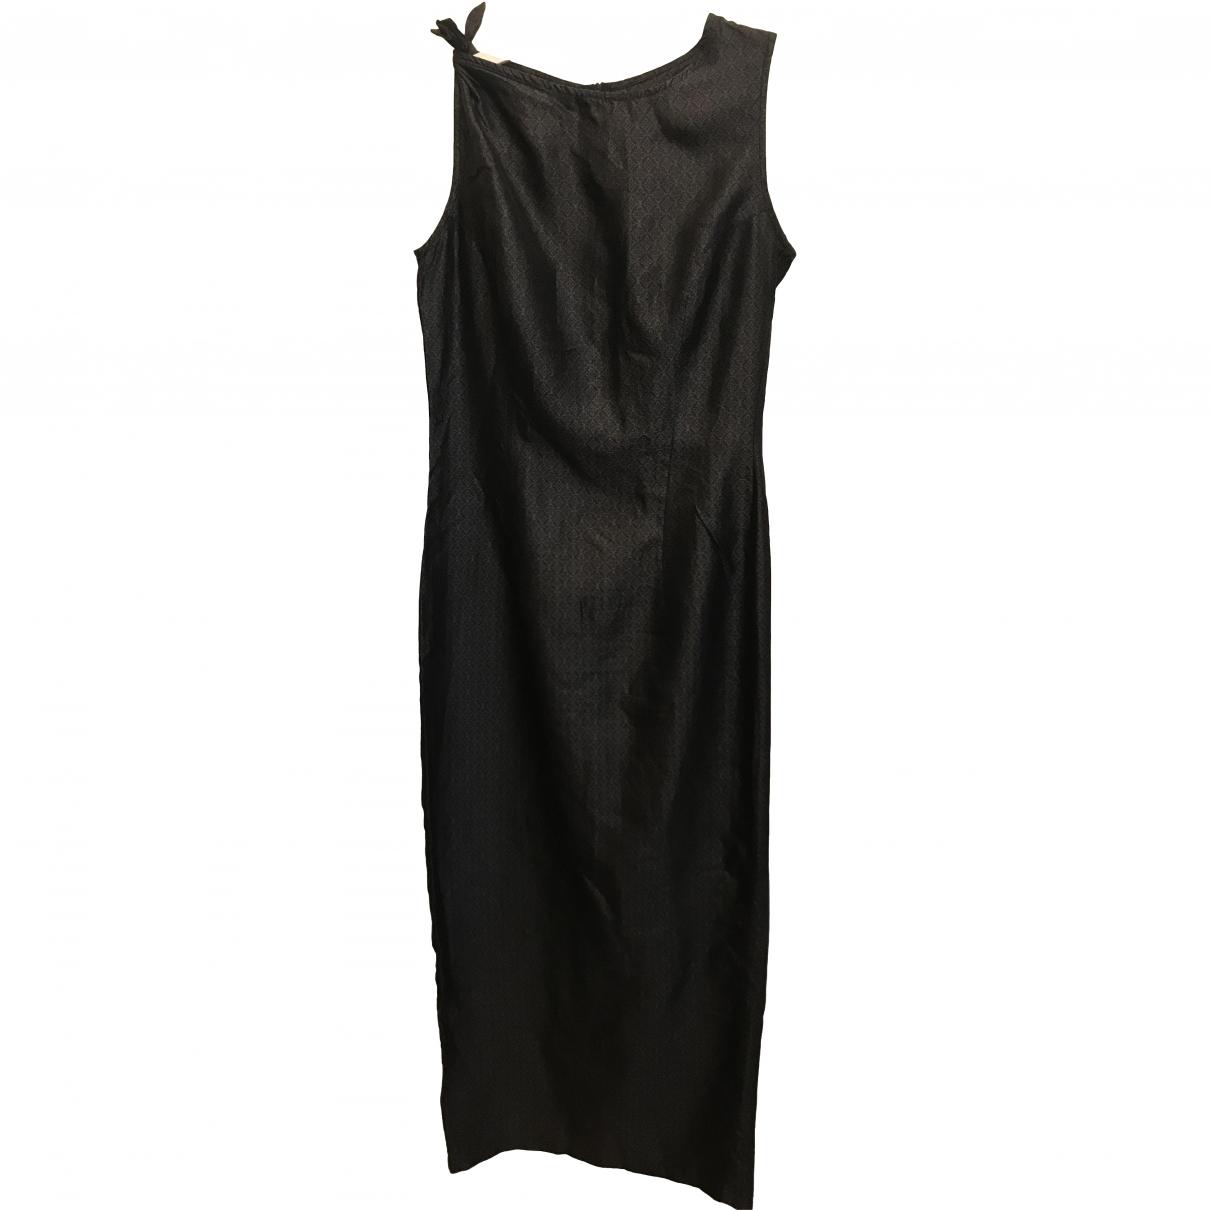 Dries Van Noten \N Black Silk dress for Women 38 FR